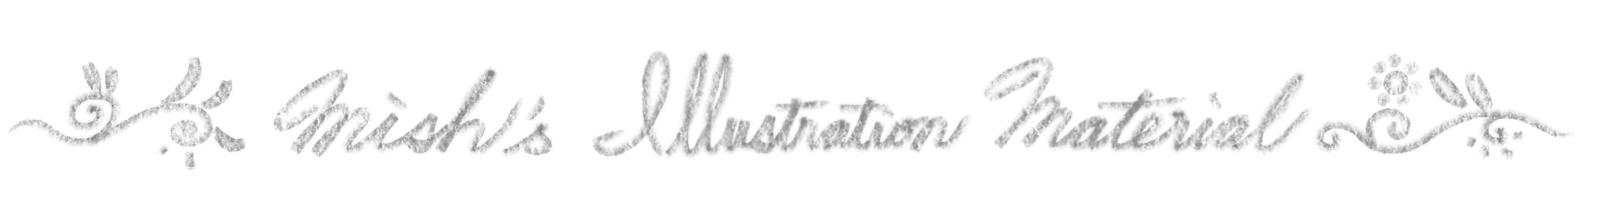 MISH's Illustration Material